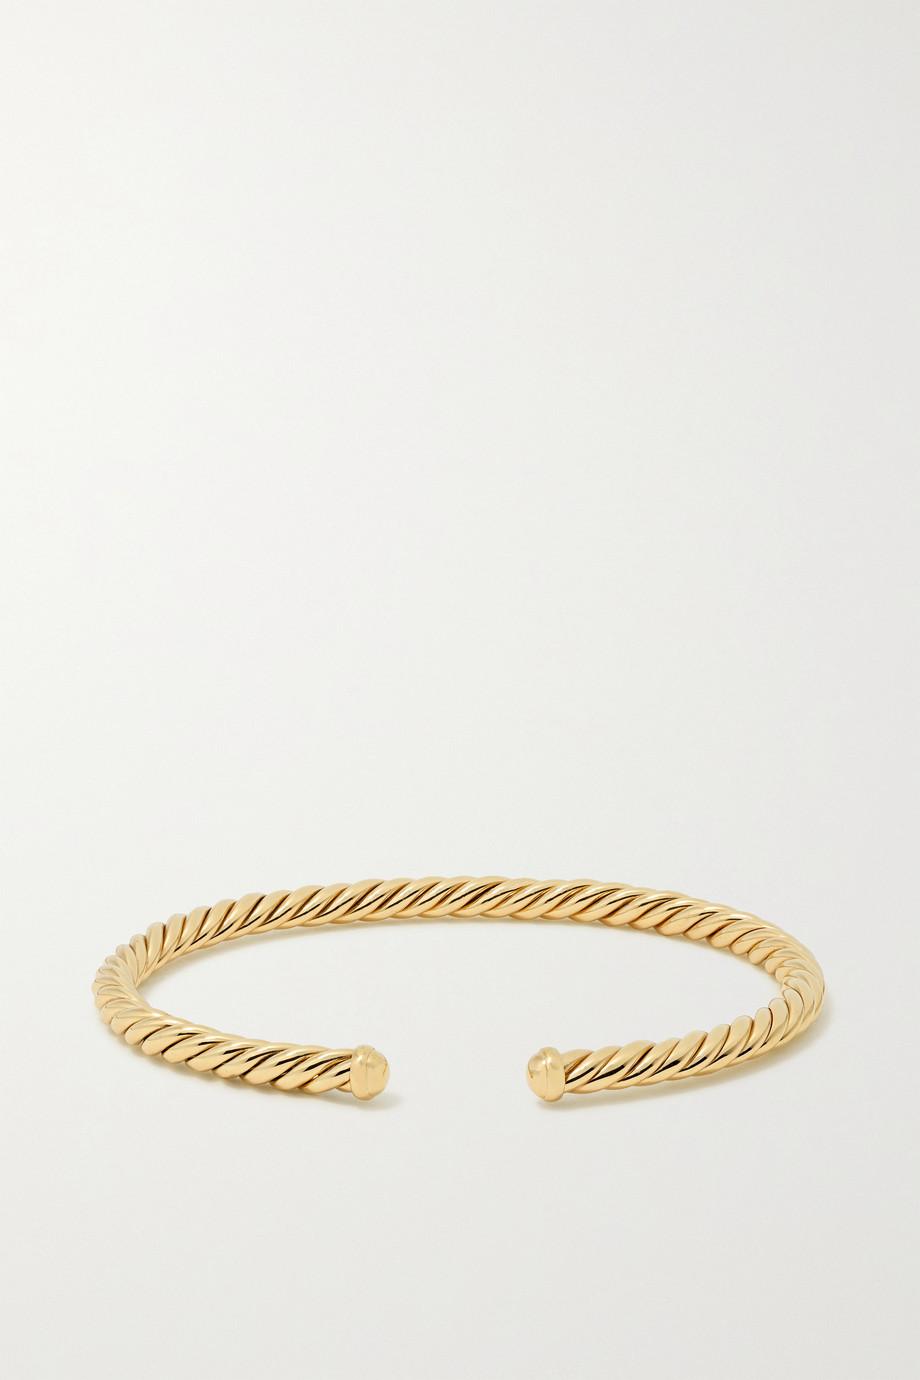 David Yurman Bracelet en or 18 carats Cable Spira